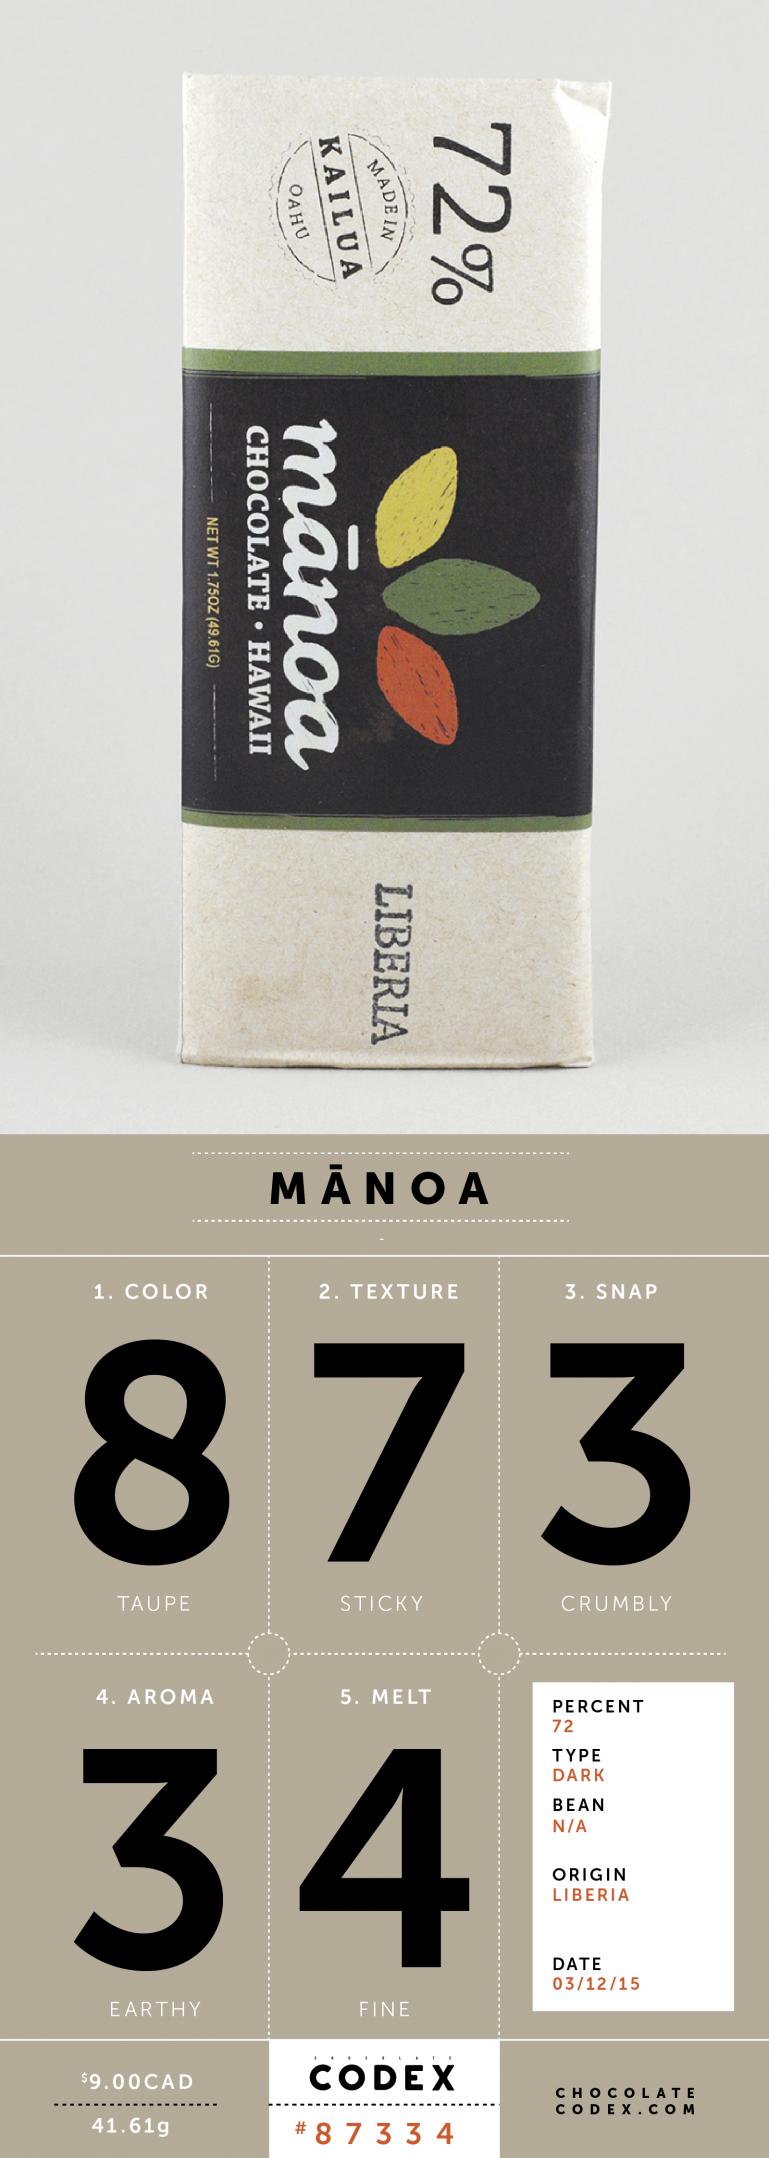 Chocolate-Codex-Review-Mano-72-Liberia